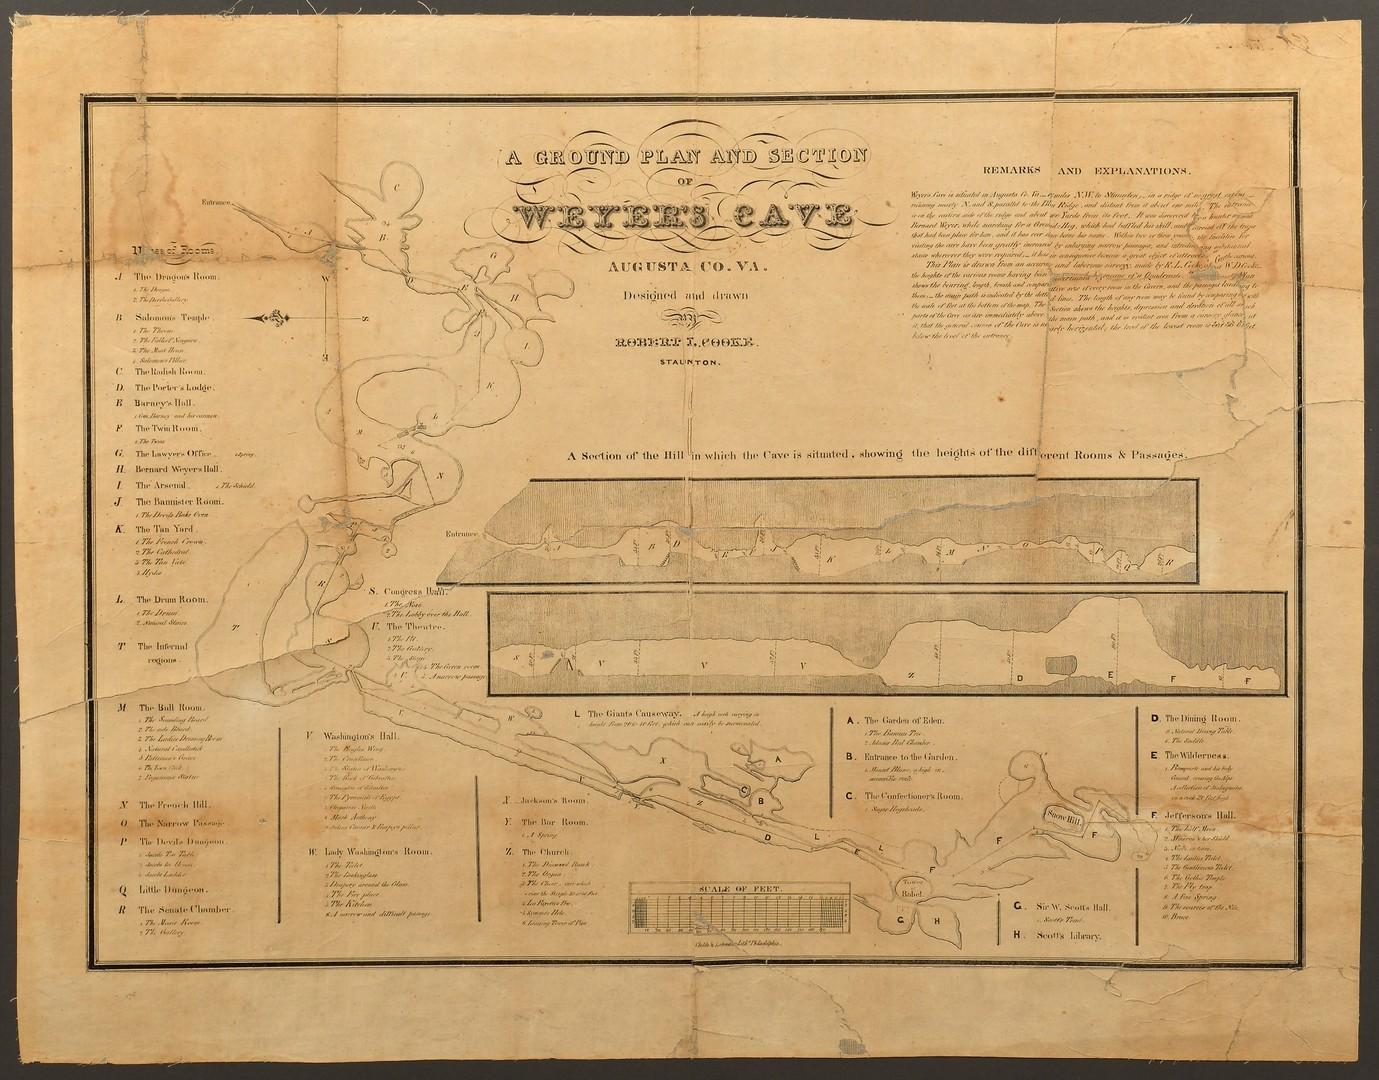 Lot 574: Weyer's Grand Caverns Cave Map, ca. 1835